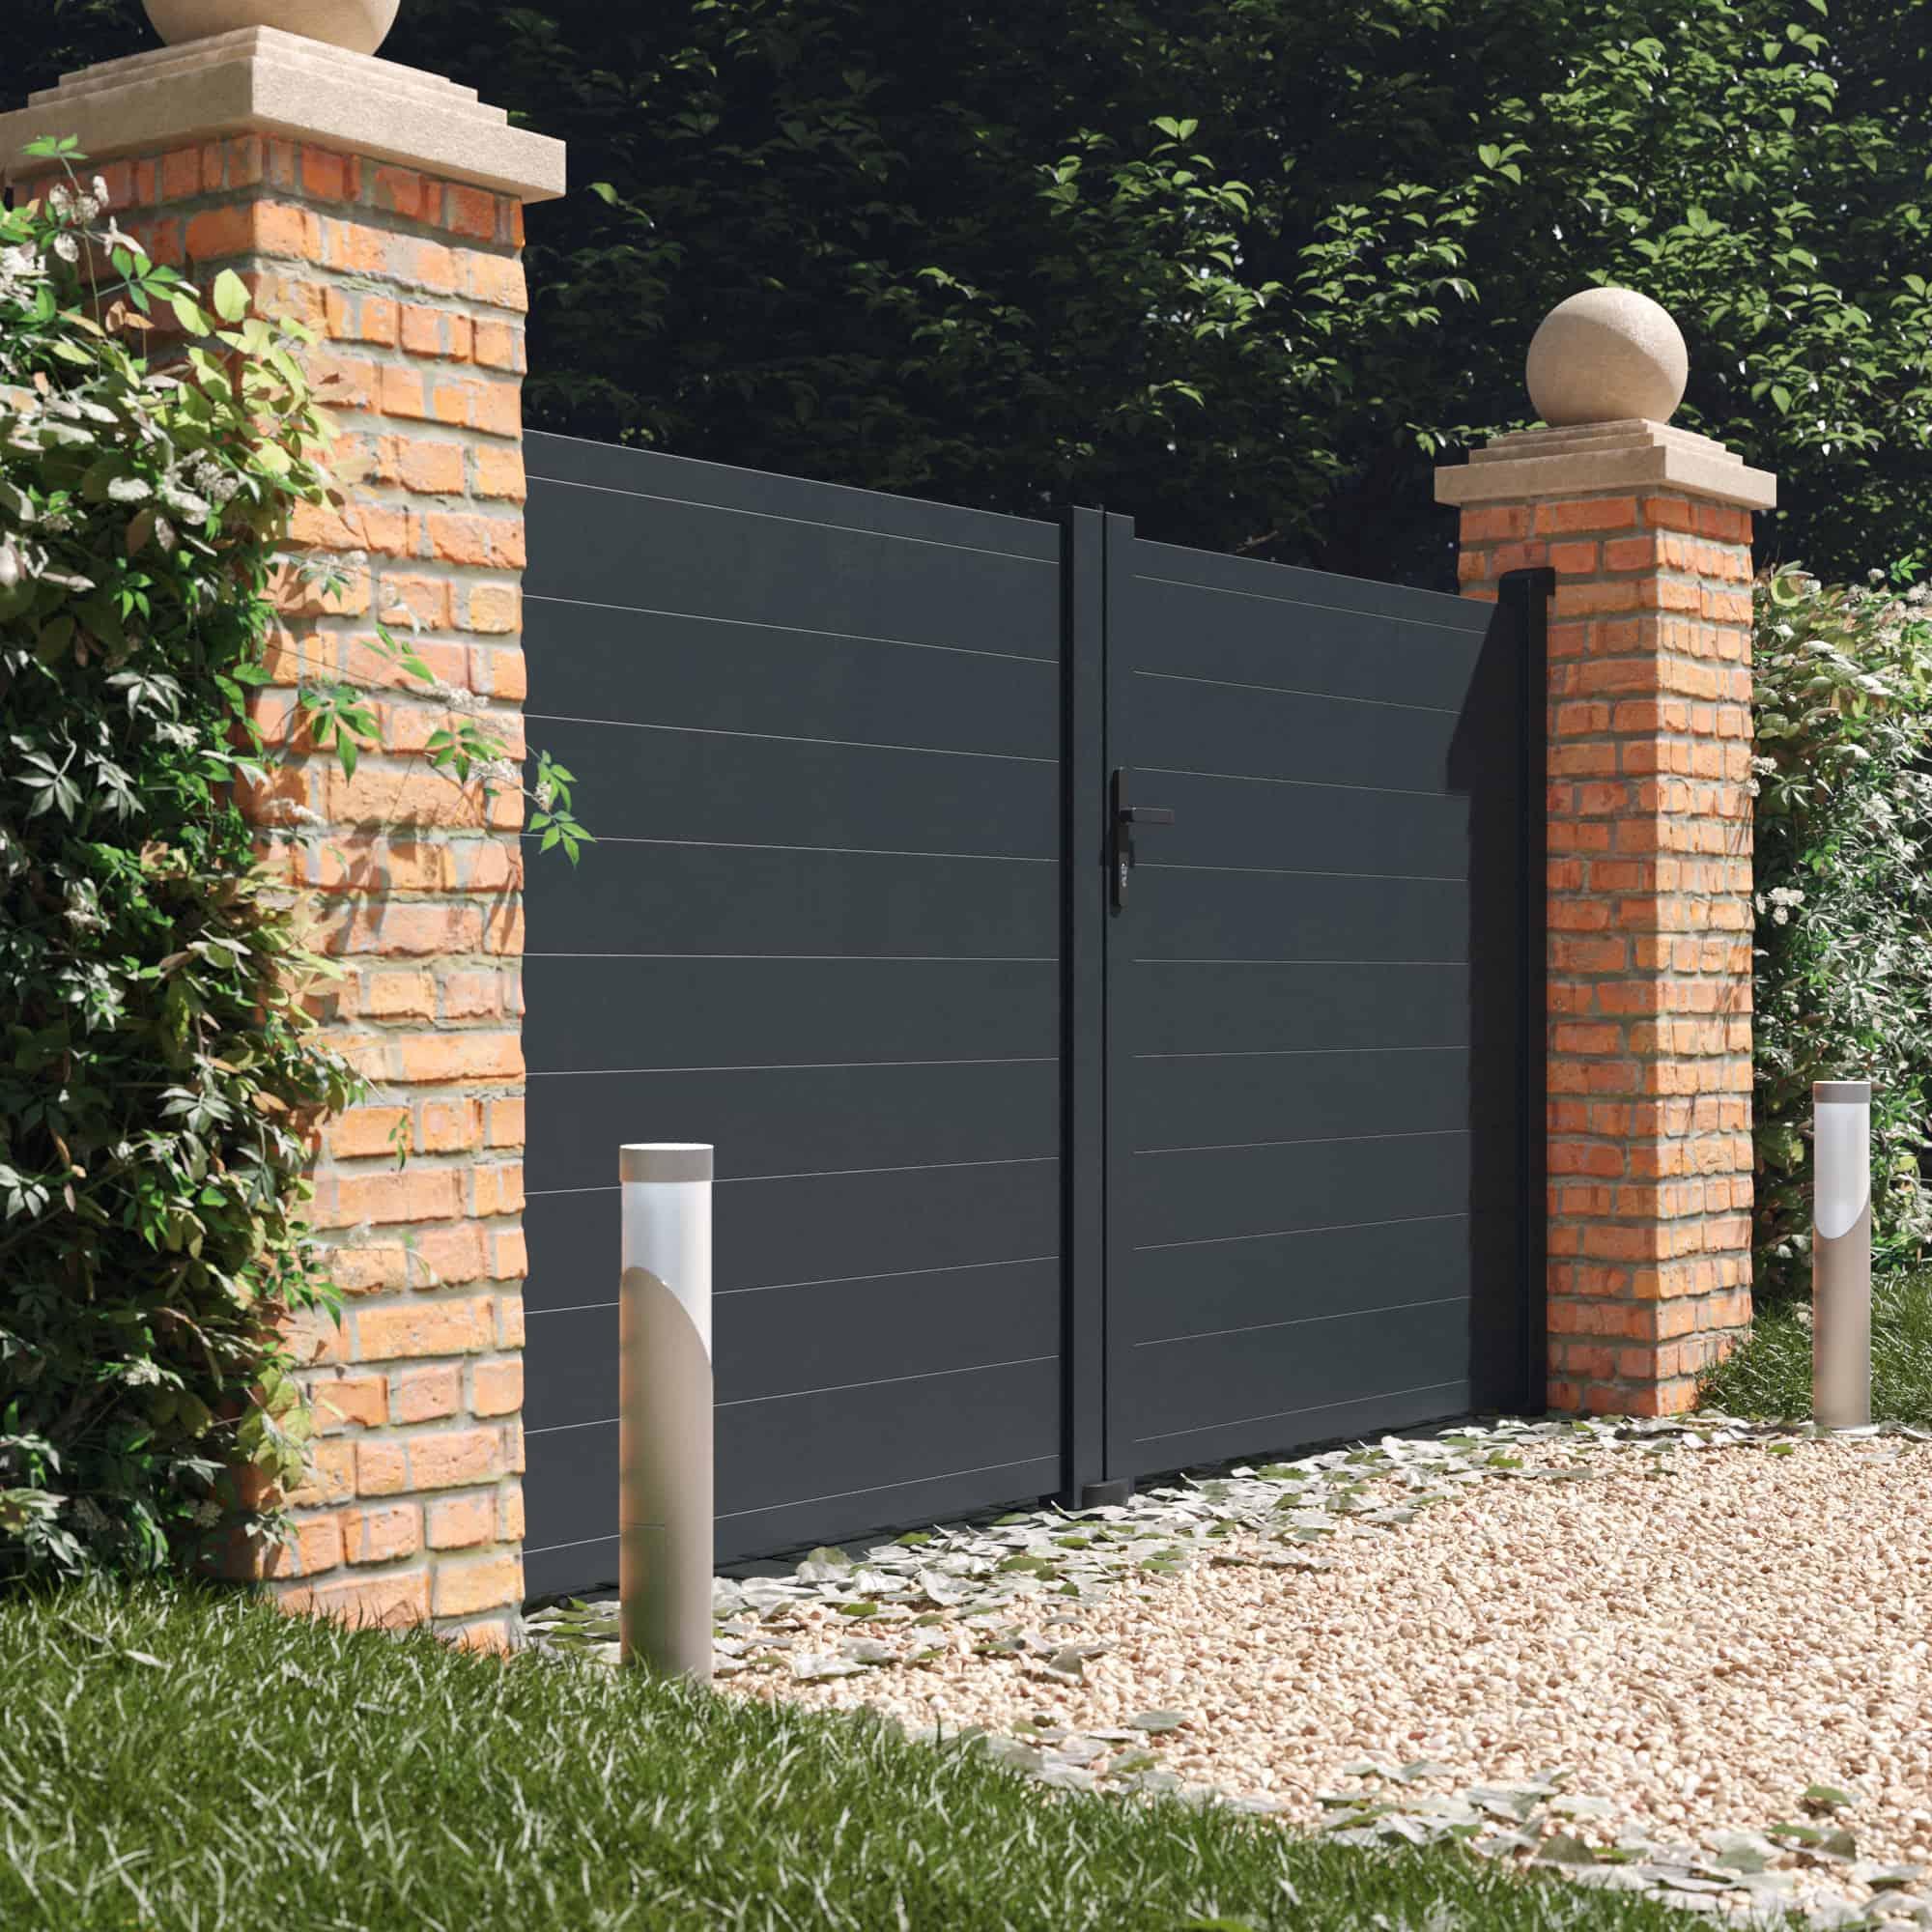 BillyOh Valencia double swing driveway gate